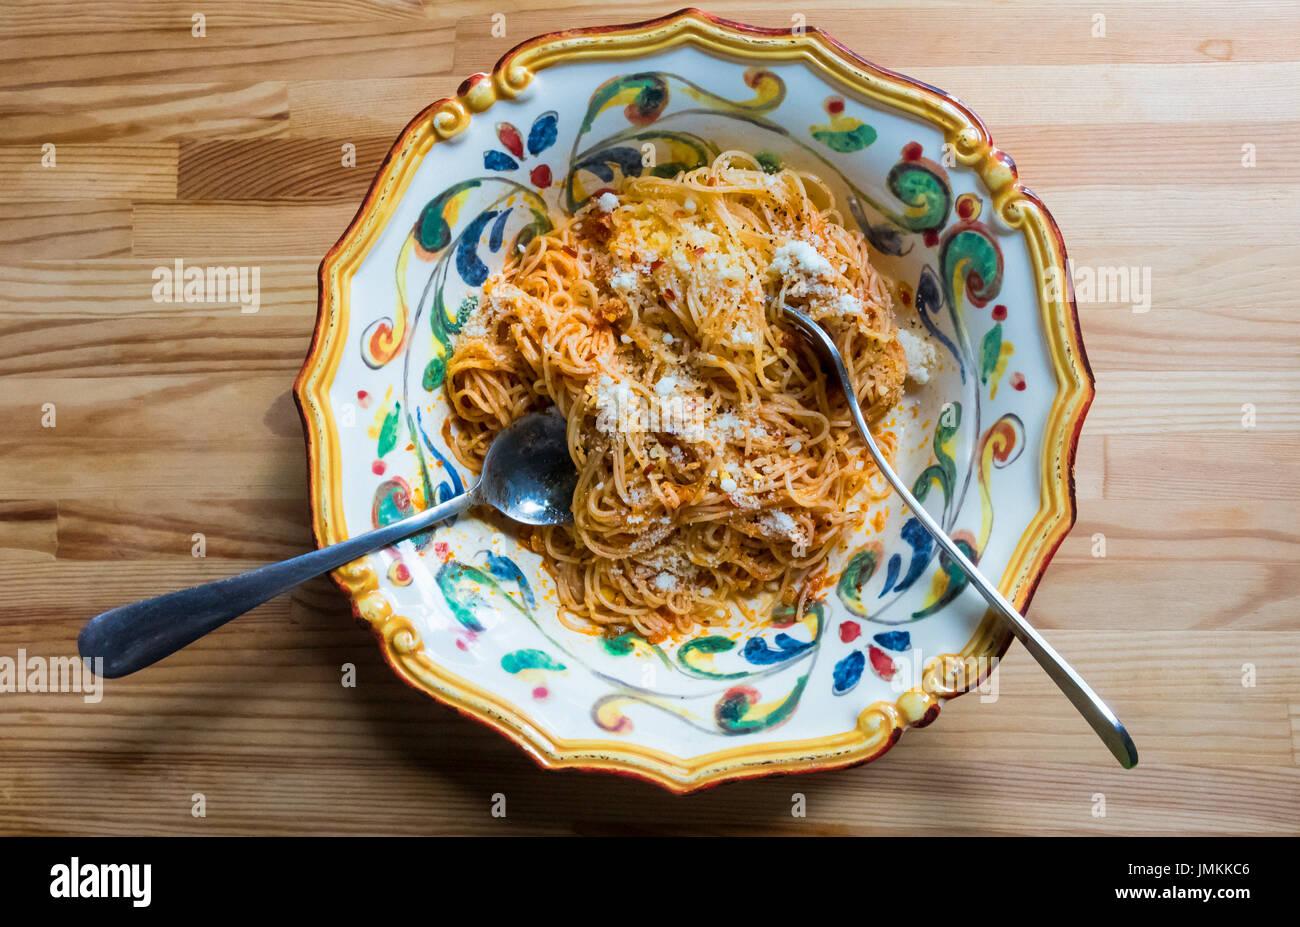 Spaghettini, dünne Nudeln mit Tomaten, Zwiebeln, Butter und PARMIGIANO-REGGIANO-Käse (Parmesan). Stockbild